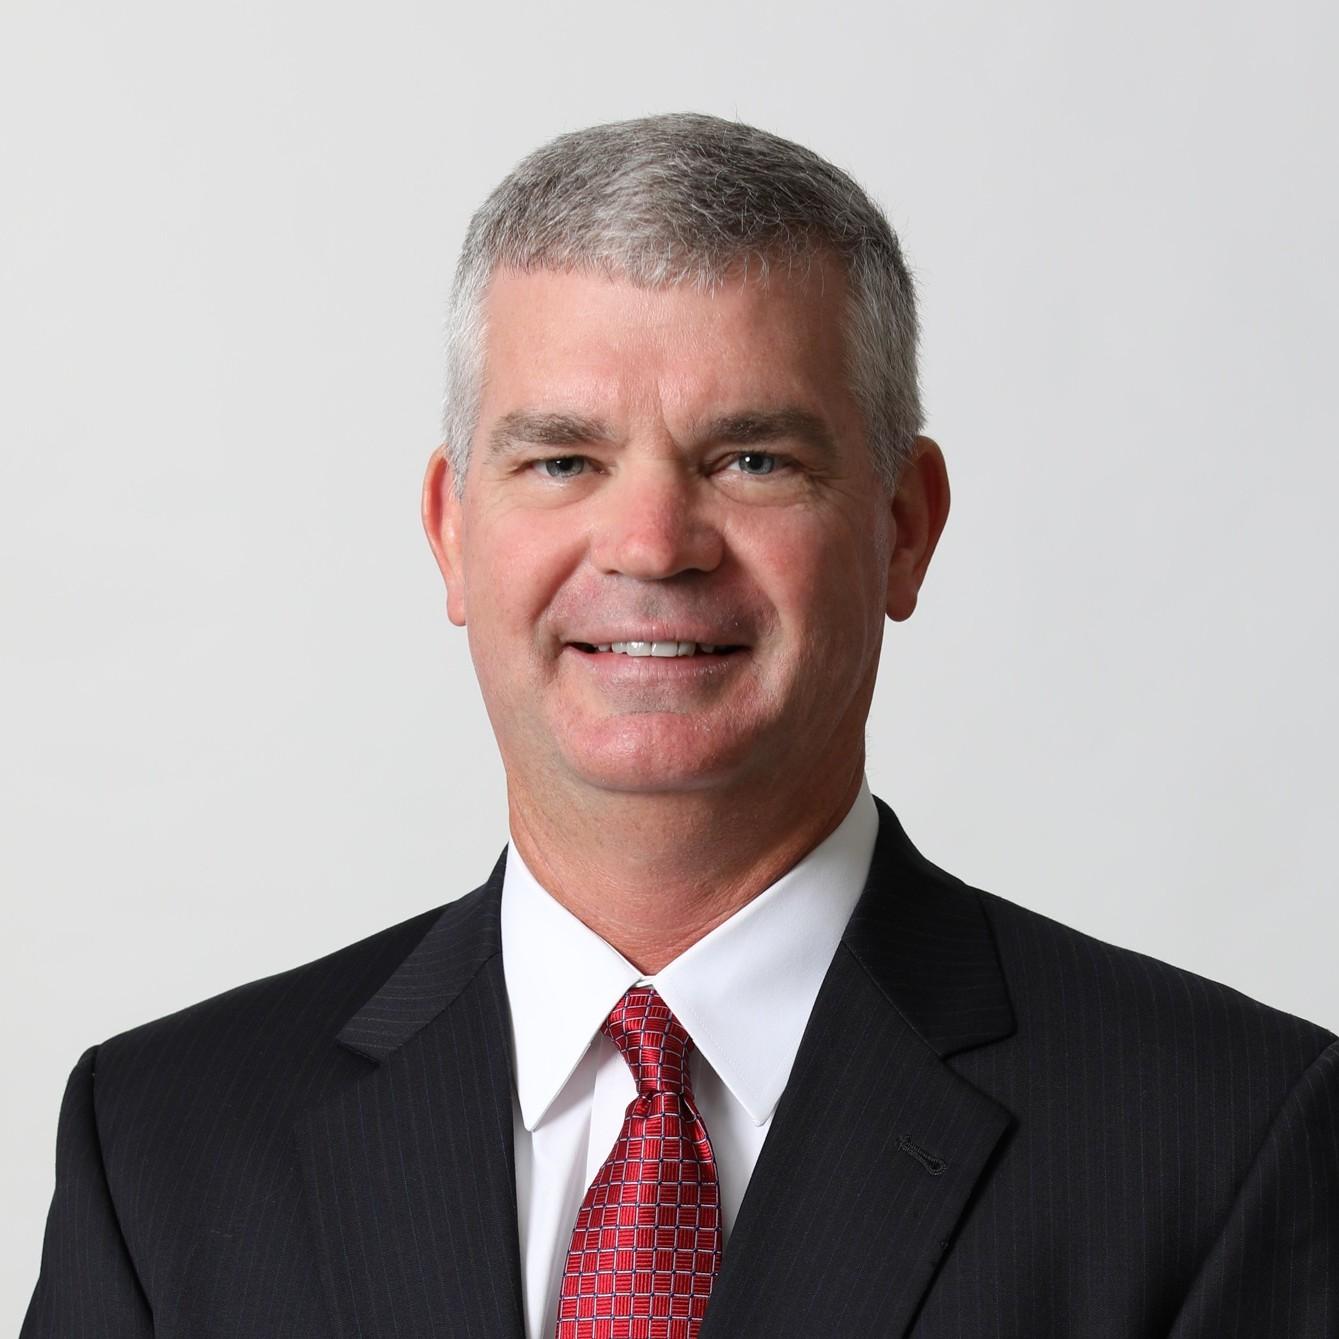 Past President: Curt Mackey